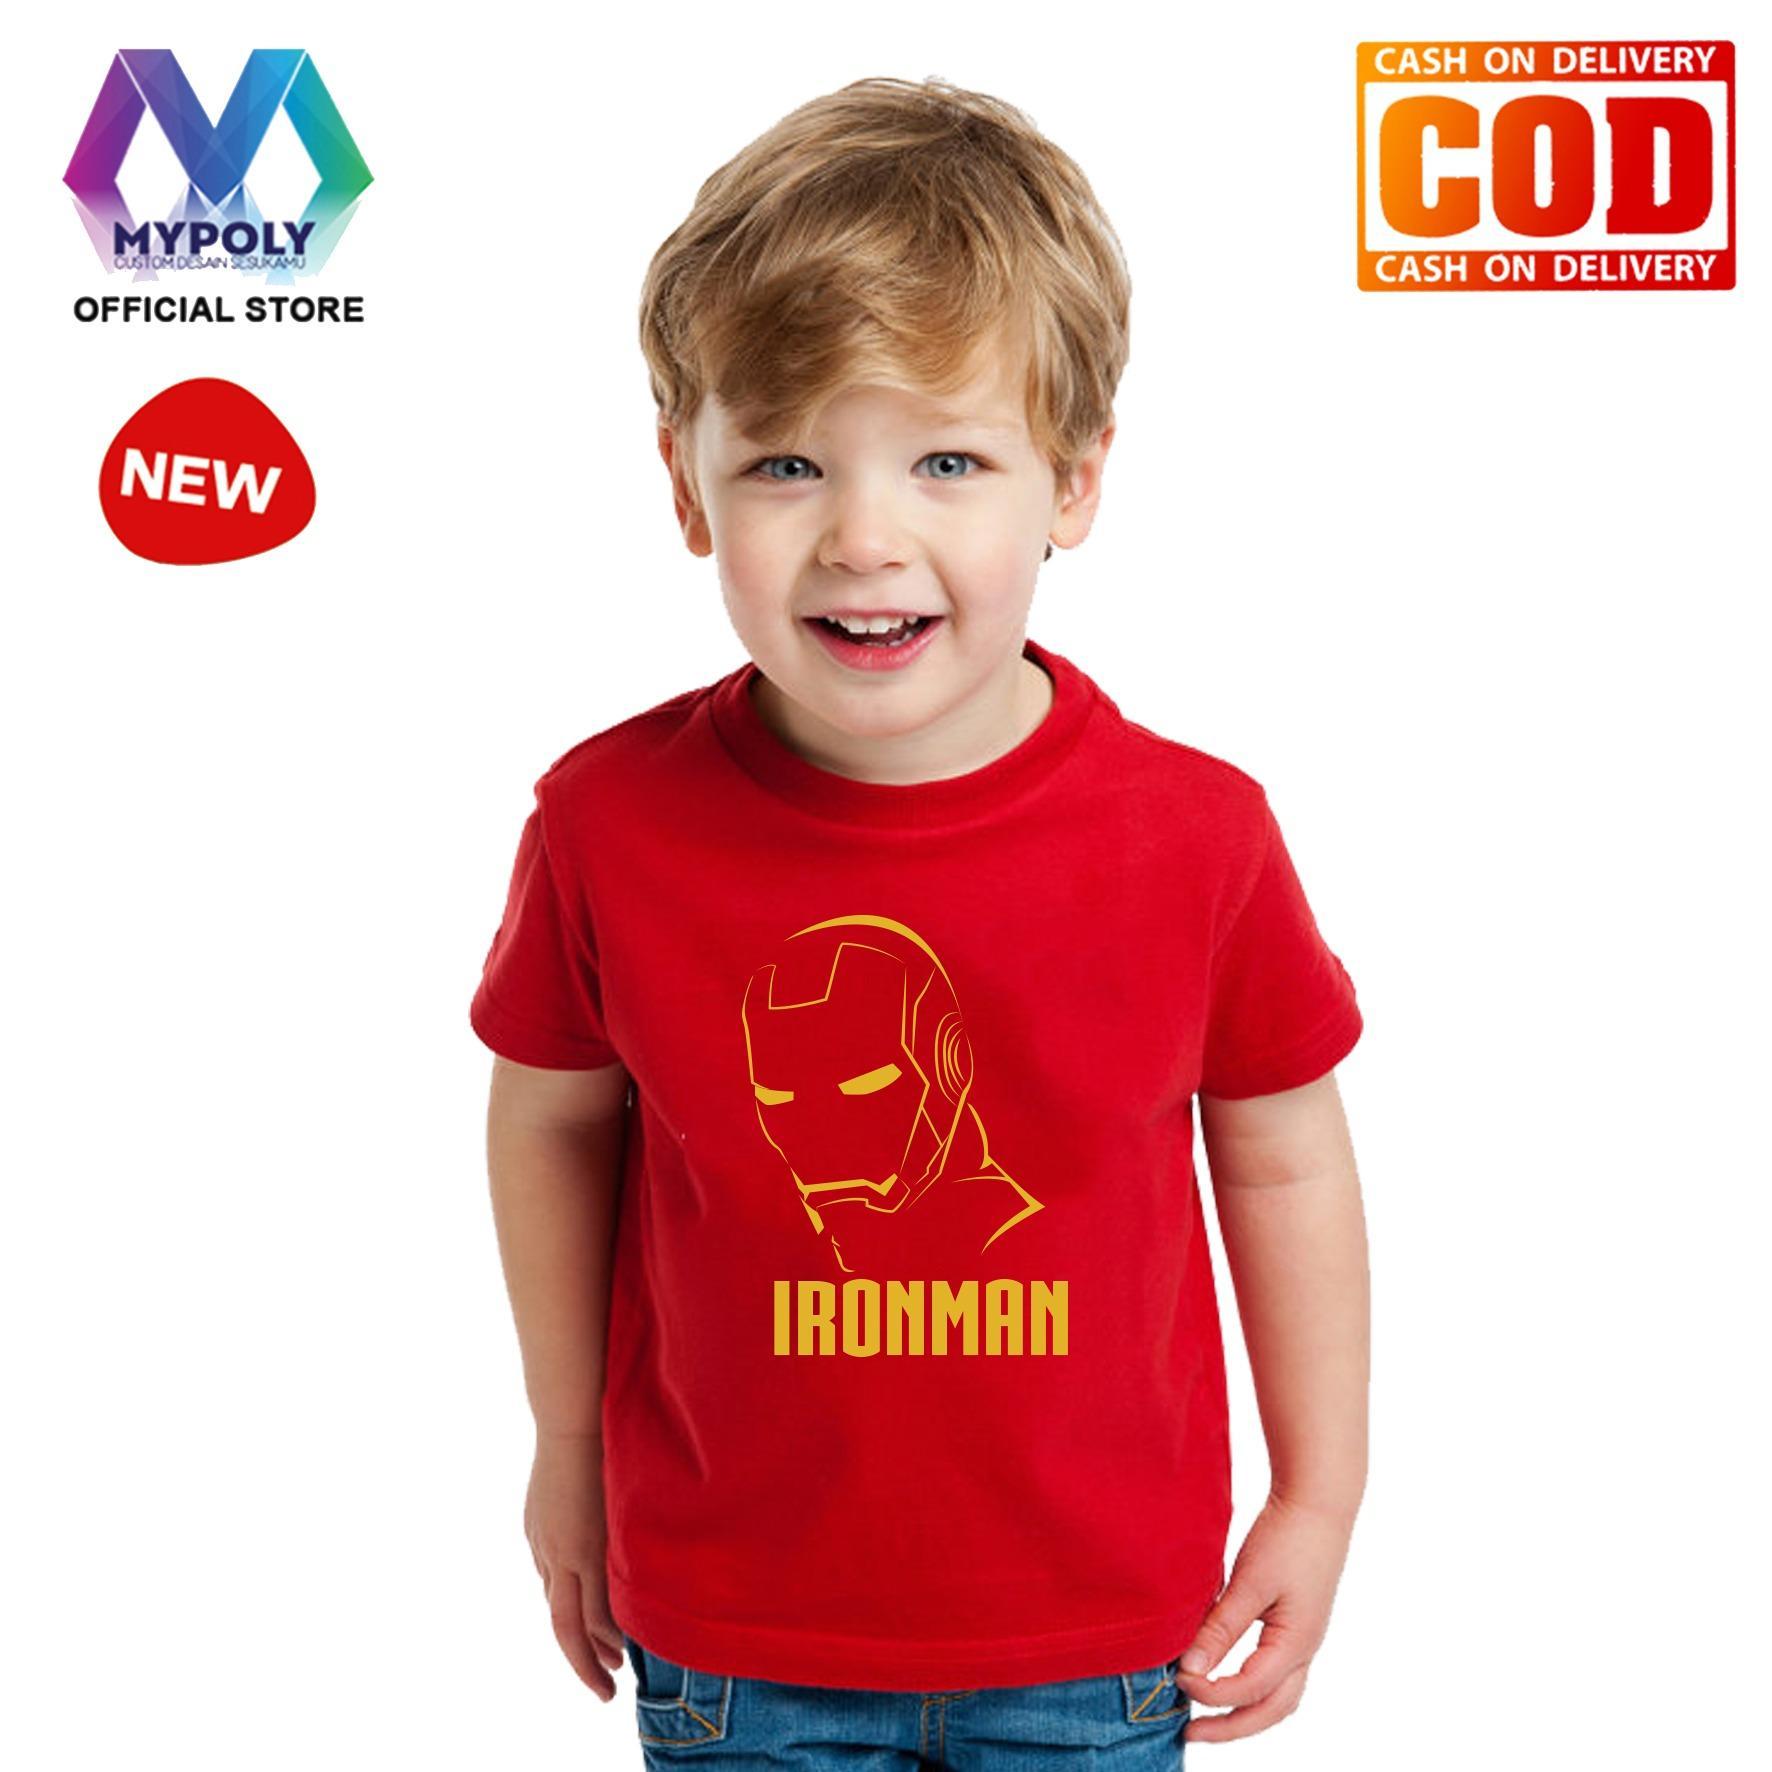 Kaos Premium Mypoly Anak Pria laki-laki AP / Baju Couple Family Keluarga / Tshirt distro / Fashion atasan / Kaos Anime / Kaos Animasi / Kaos Super Hero / Kaos Kartun / Kaos Cartoon / Kaos Lucu / Kaos Gambar Karakter / Kaos Anak Iron Art Line